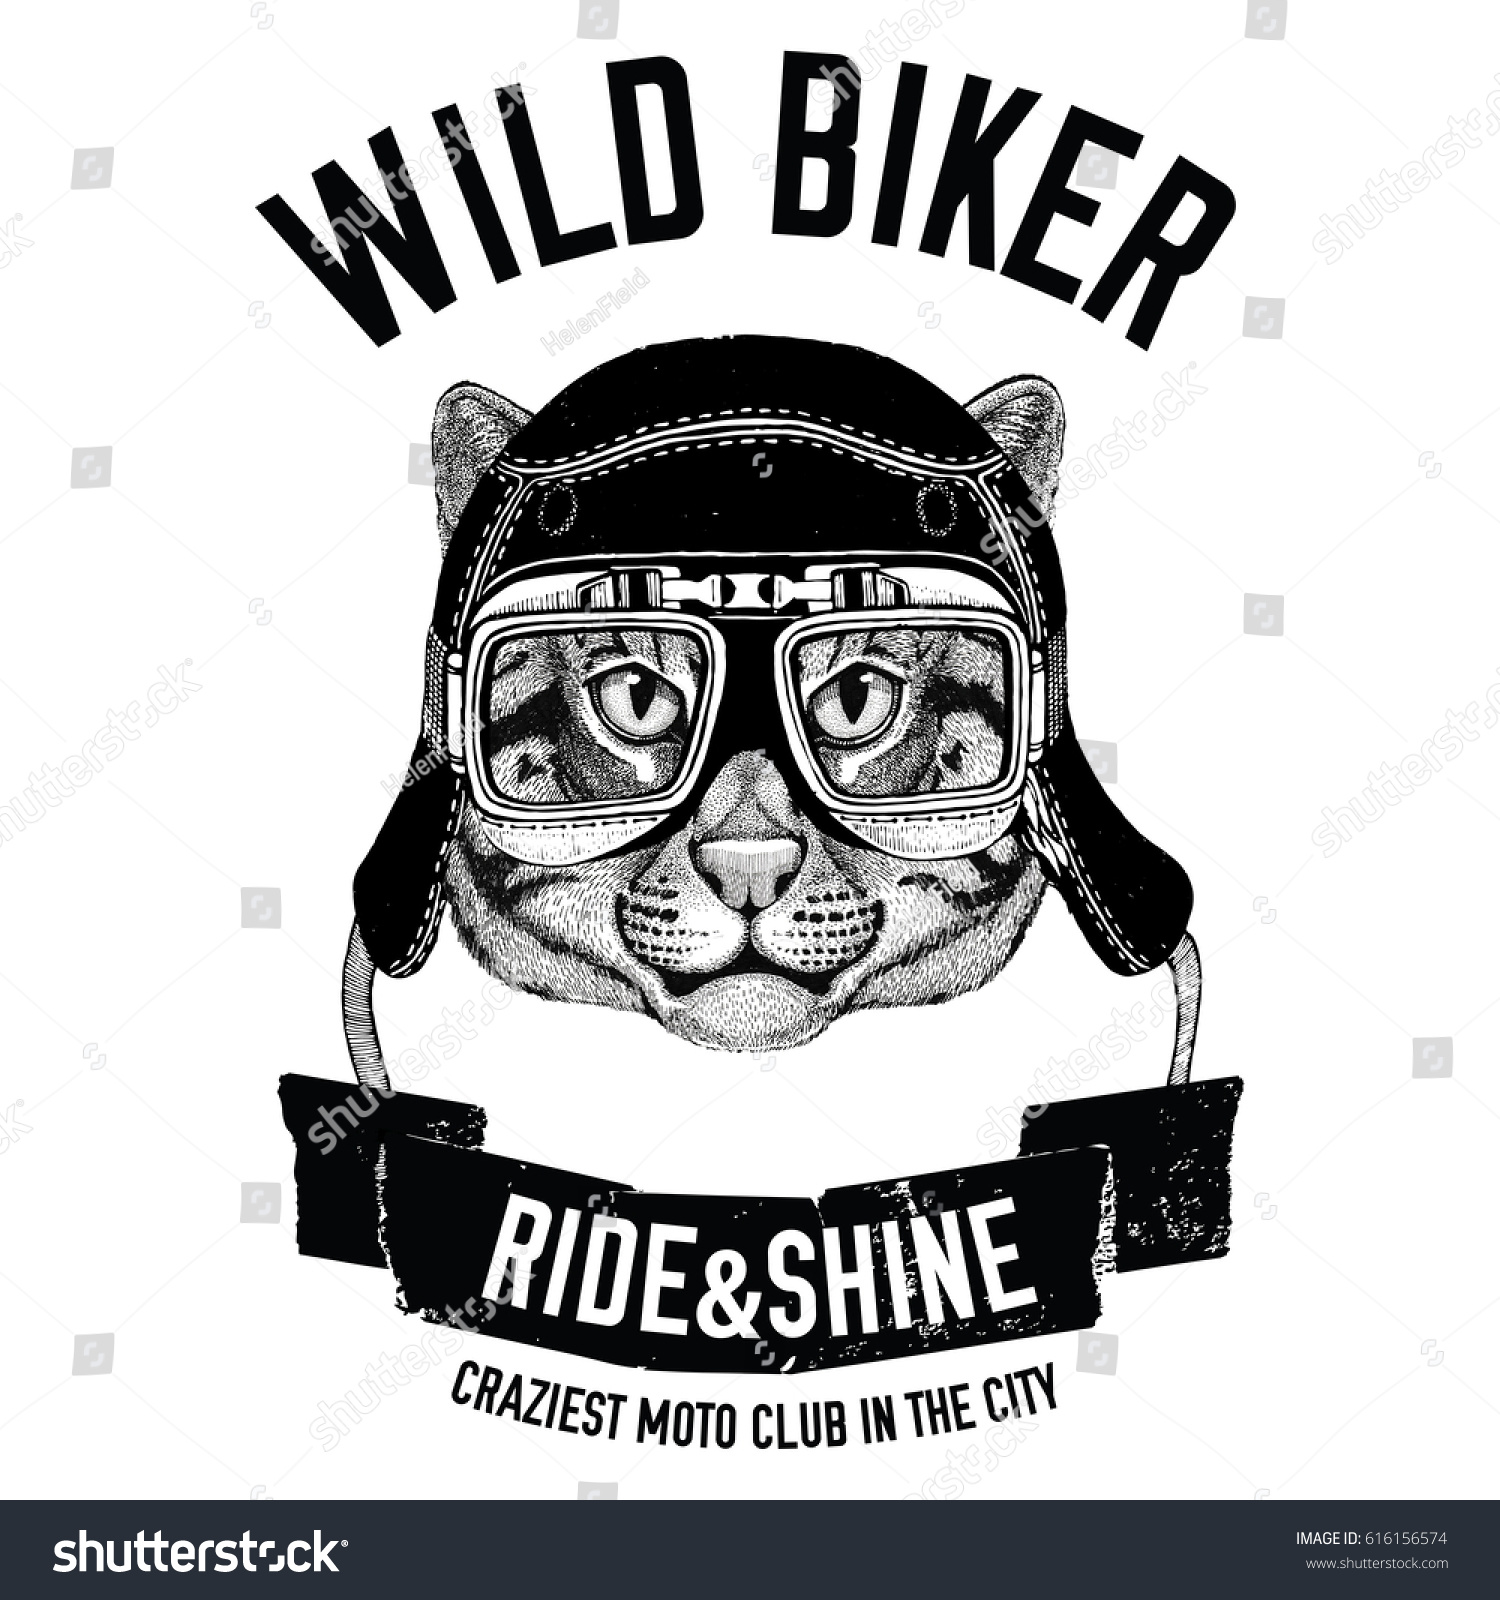 Vintage Images Fishing Cat Tshirt Design Stock Illustration